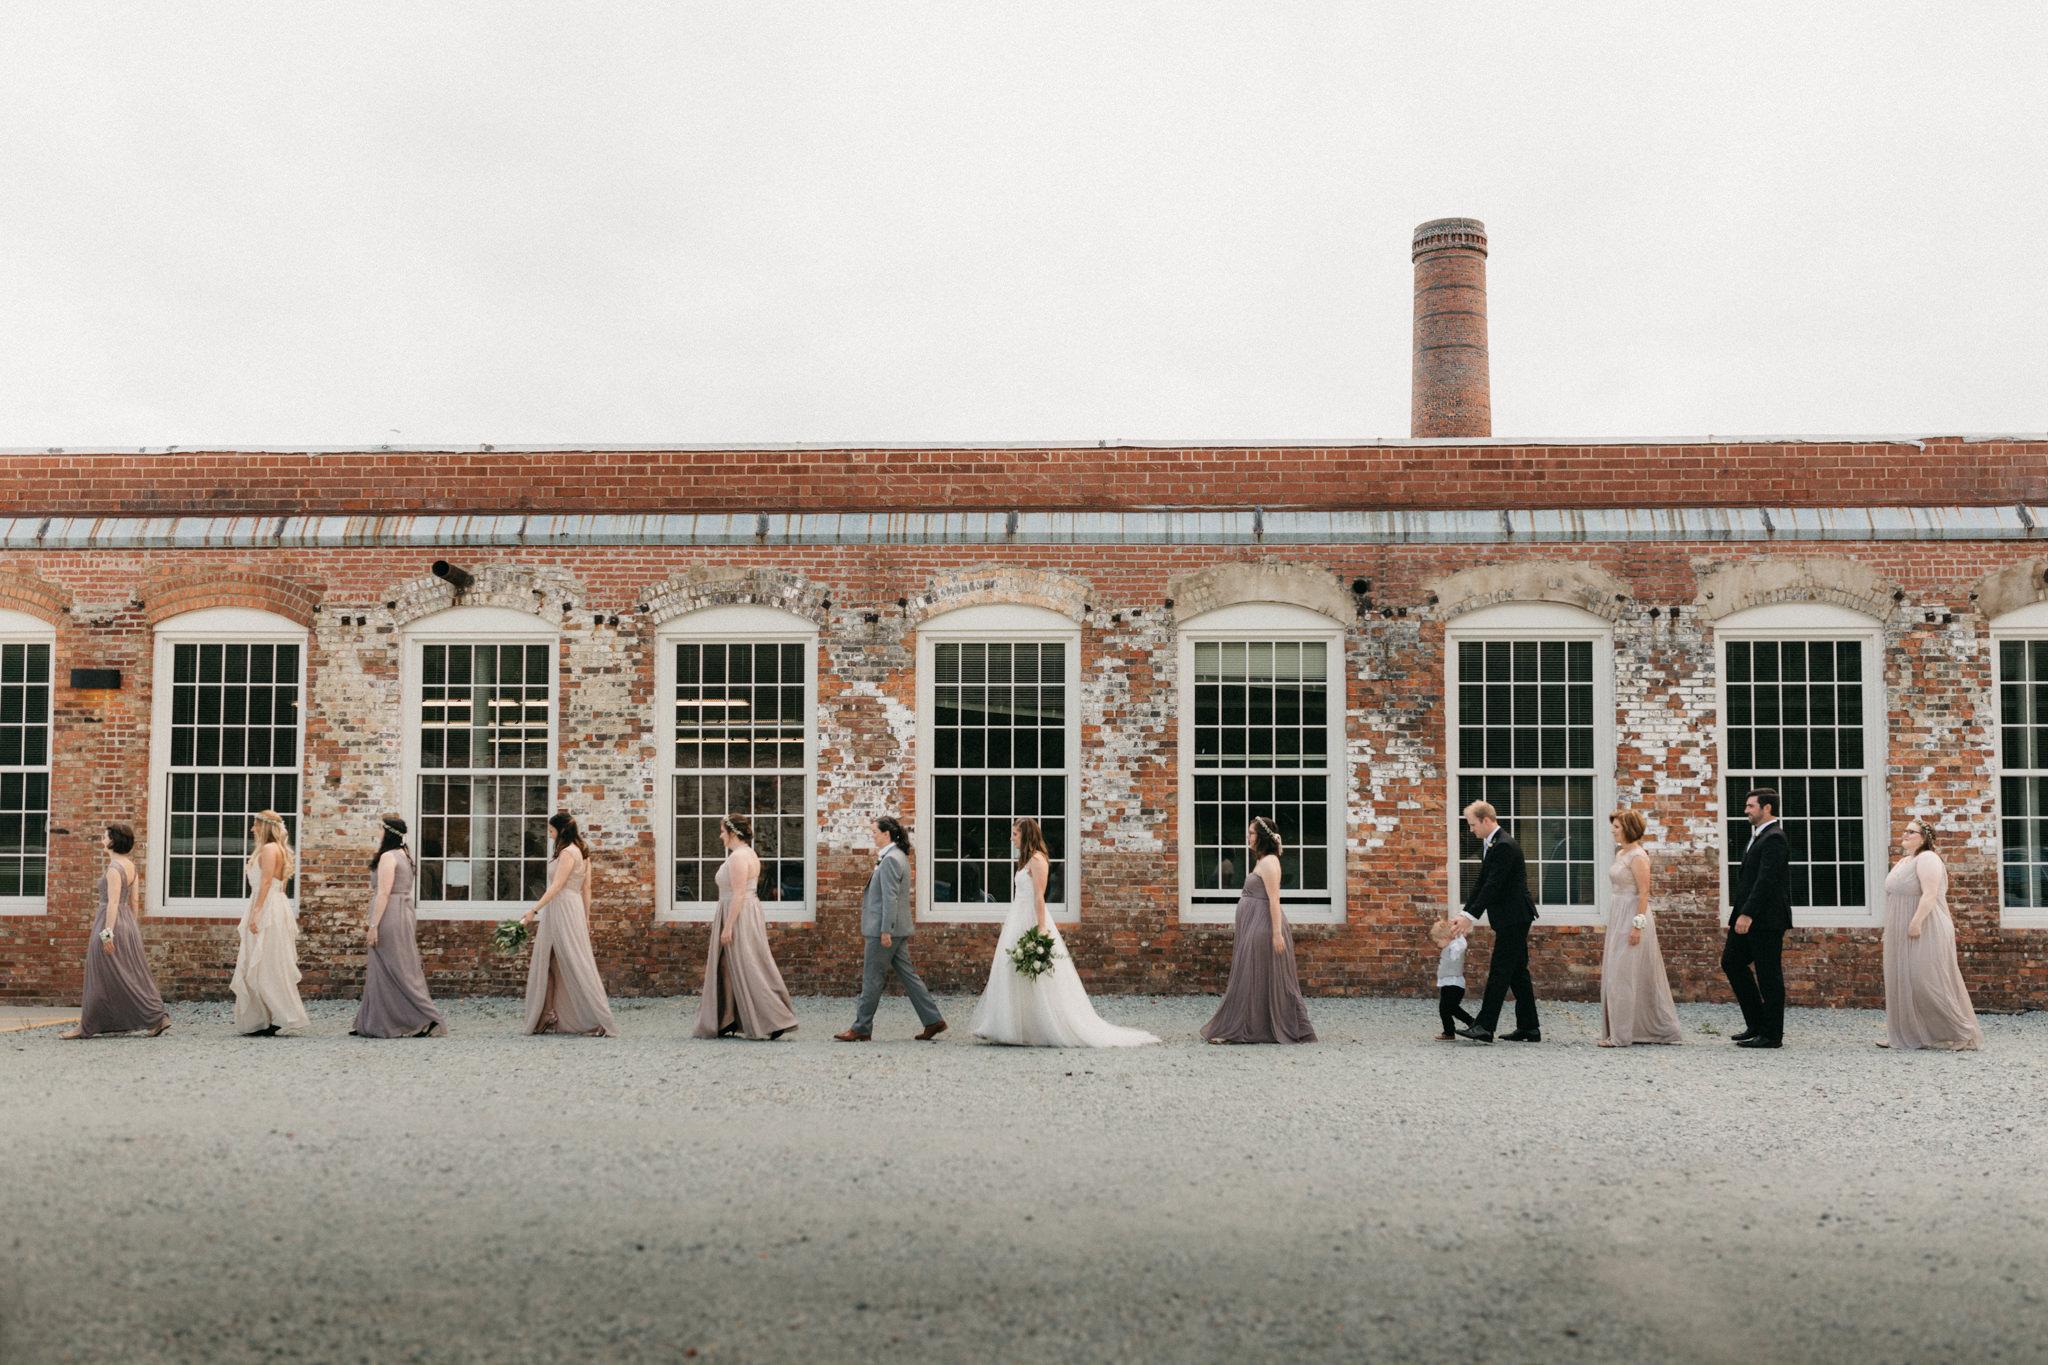 Bridal party at a same sex wedding at an old cotton mill in North Carolina.